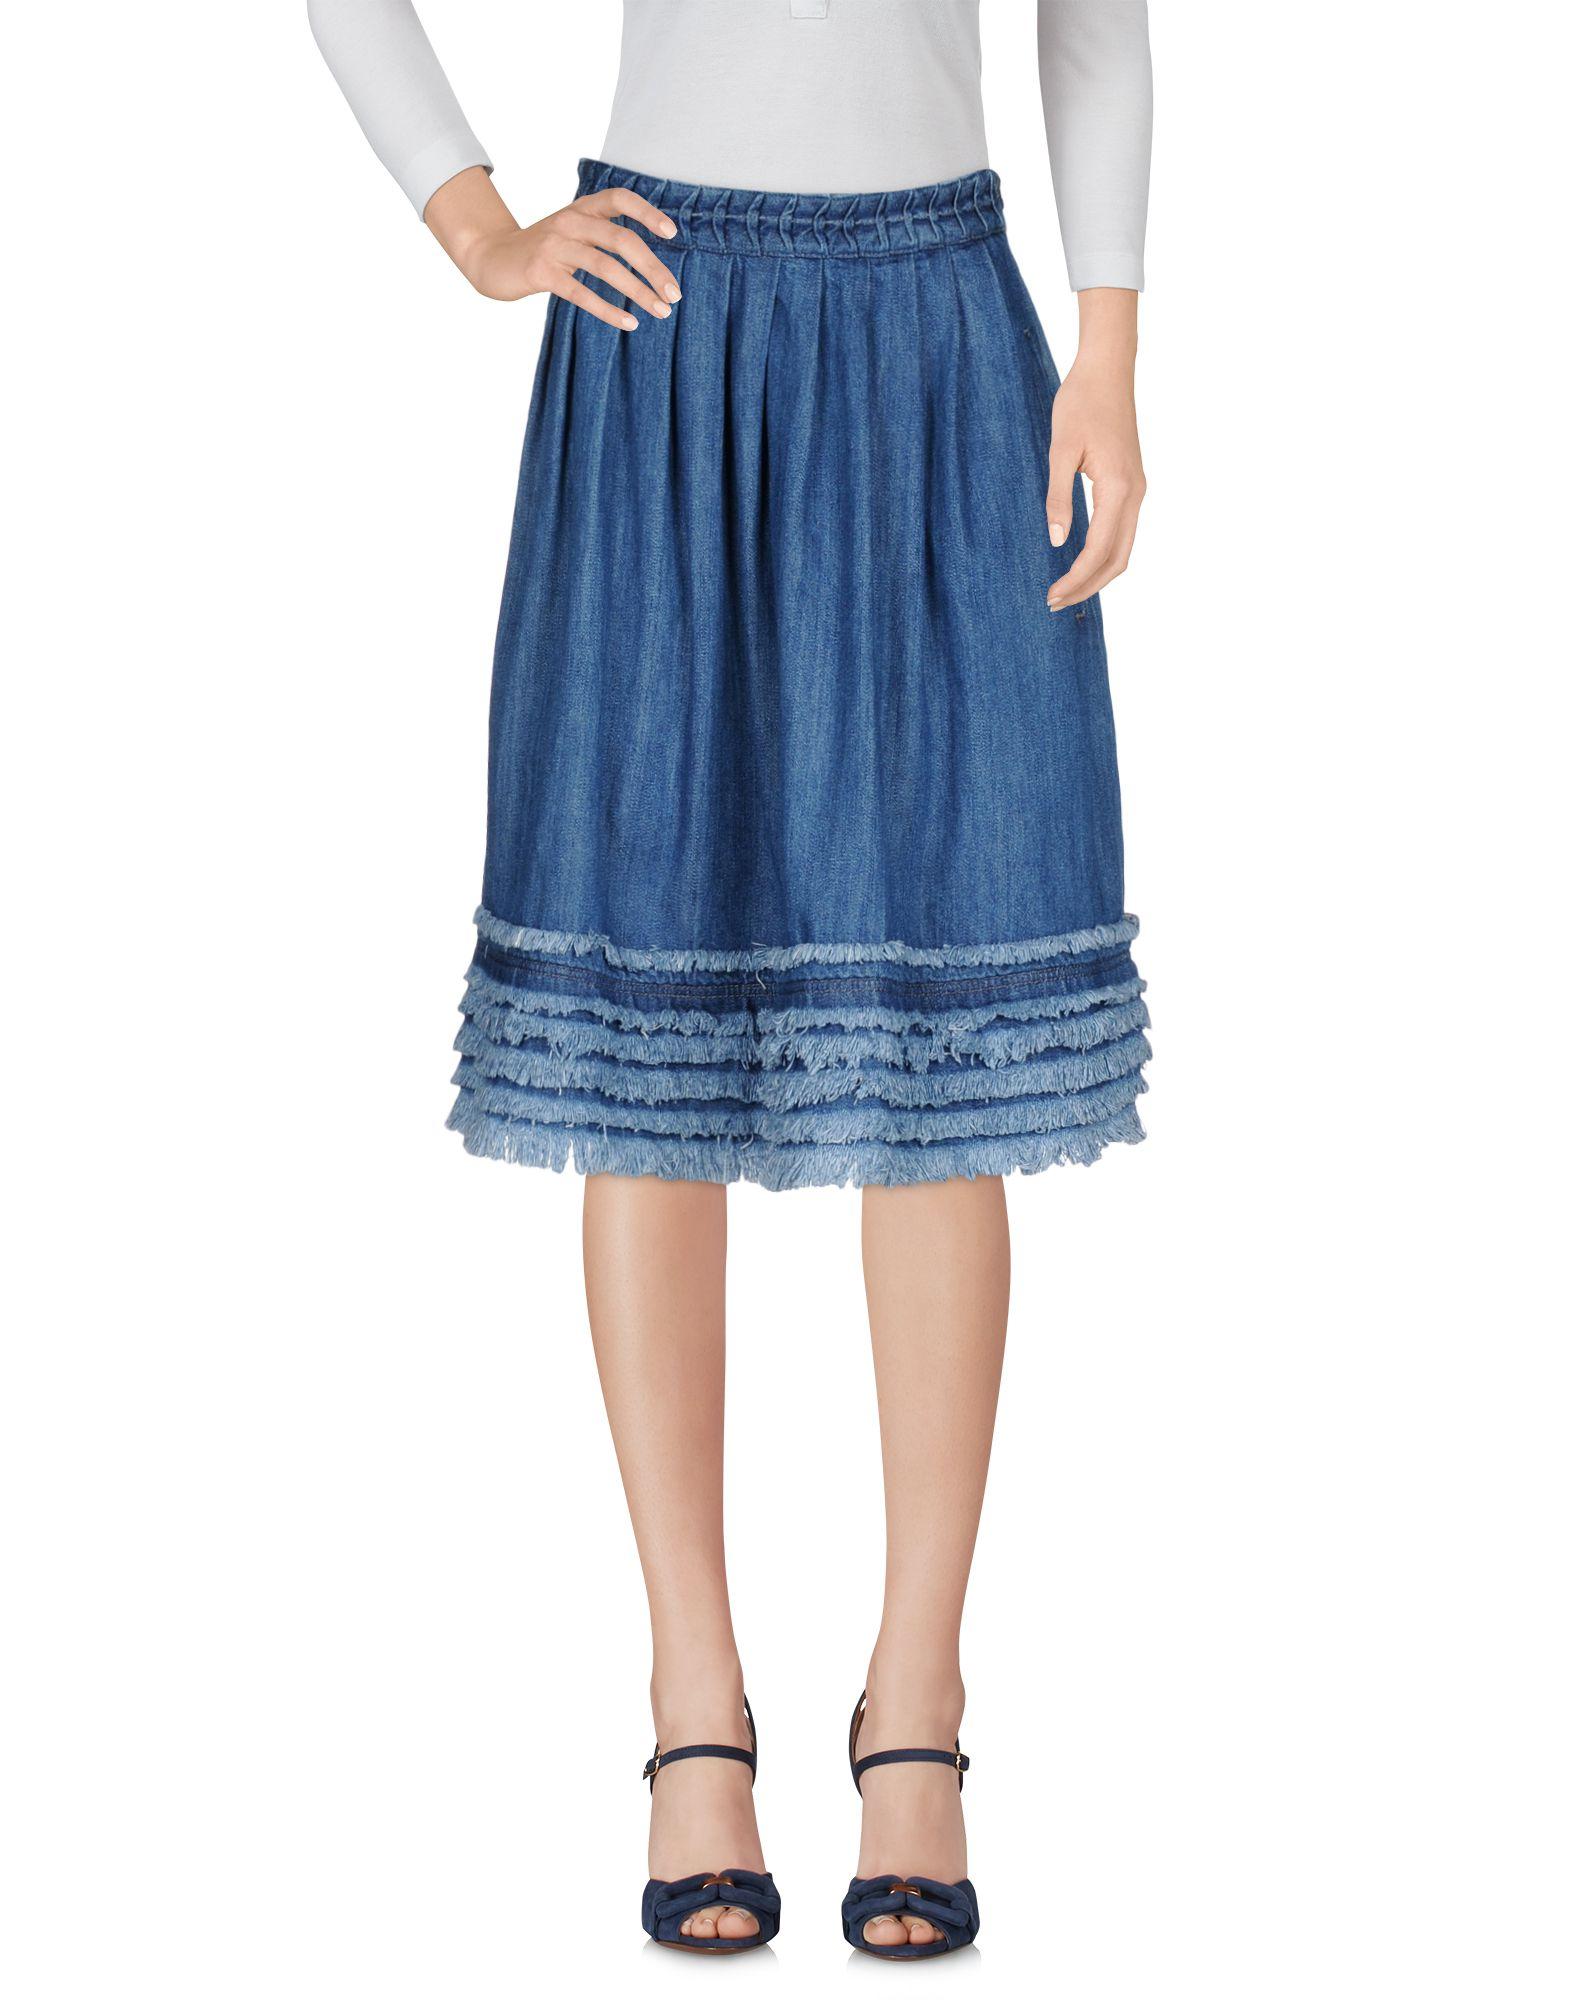 AMPERSAND HEART New York Джинсовая юбка ampersand heart new york джинсовая юбка